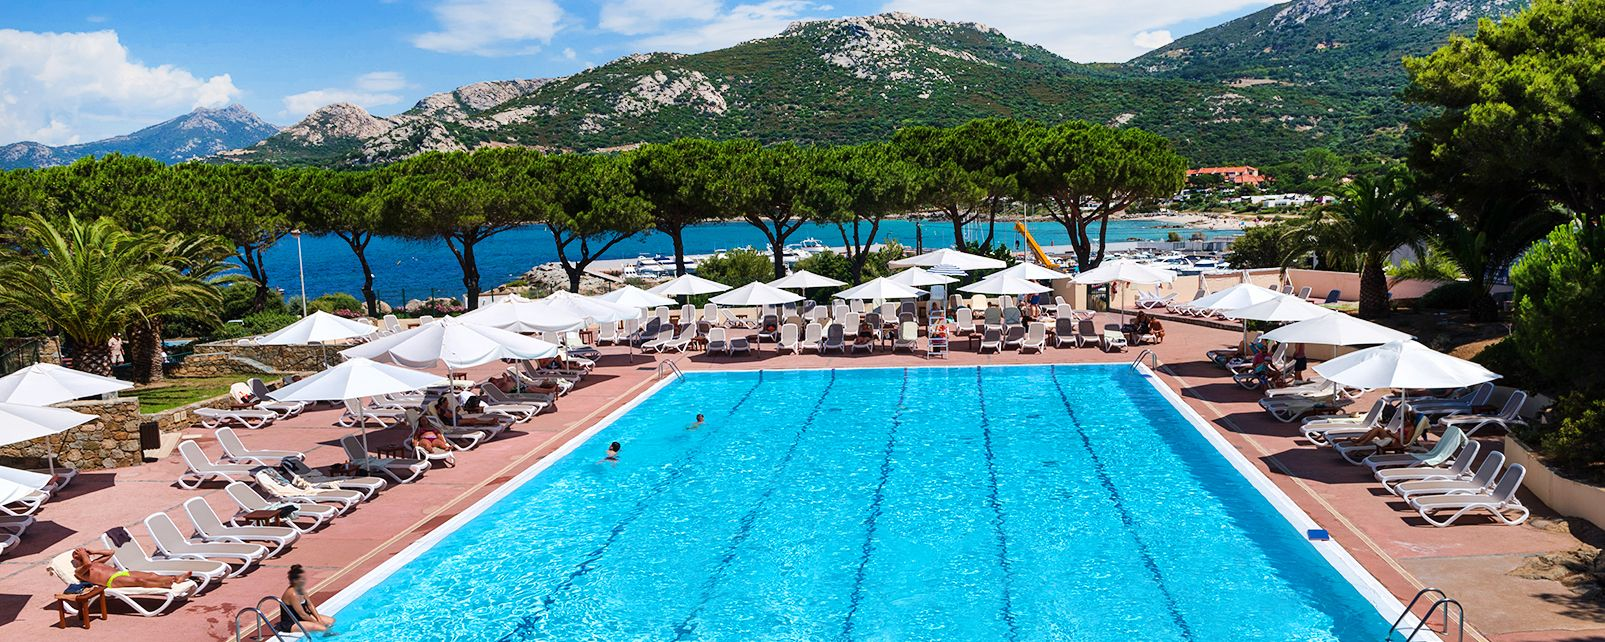 Club Med Sant'Ambrogio